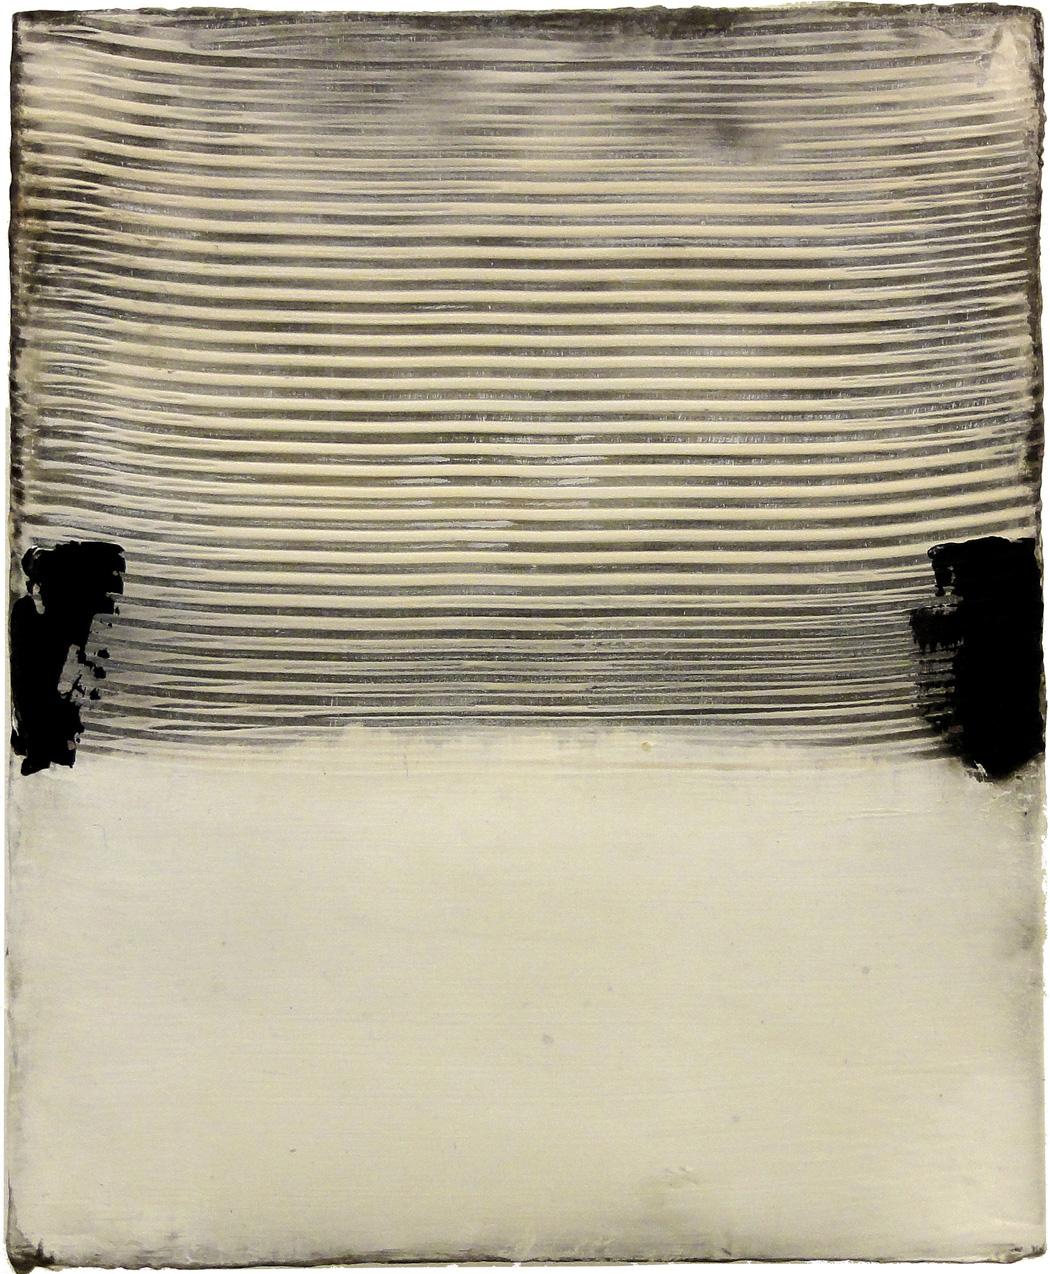 Hideaki Yamanobe_Klangassoziationen Form No. 126, 2015, Acryl-Mischtechnik auf LW, 28 x 23 cm